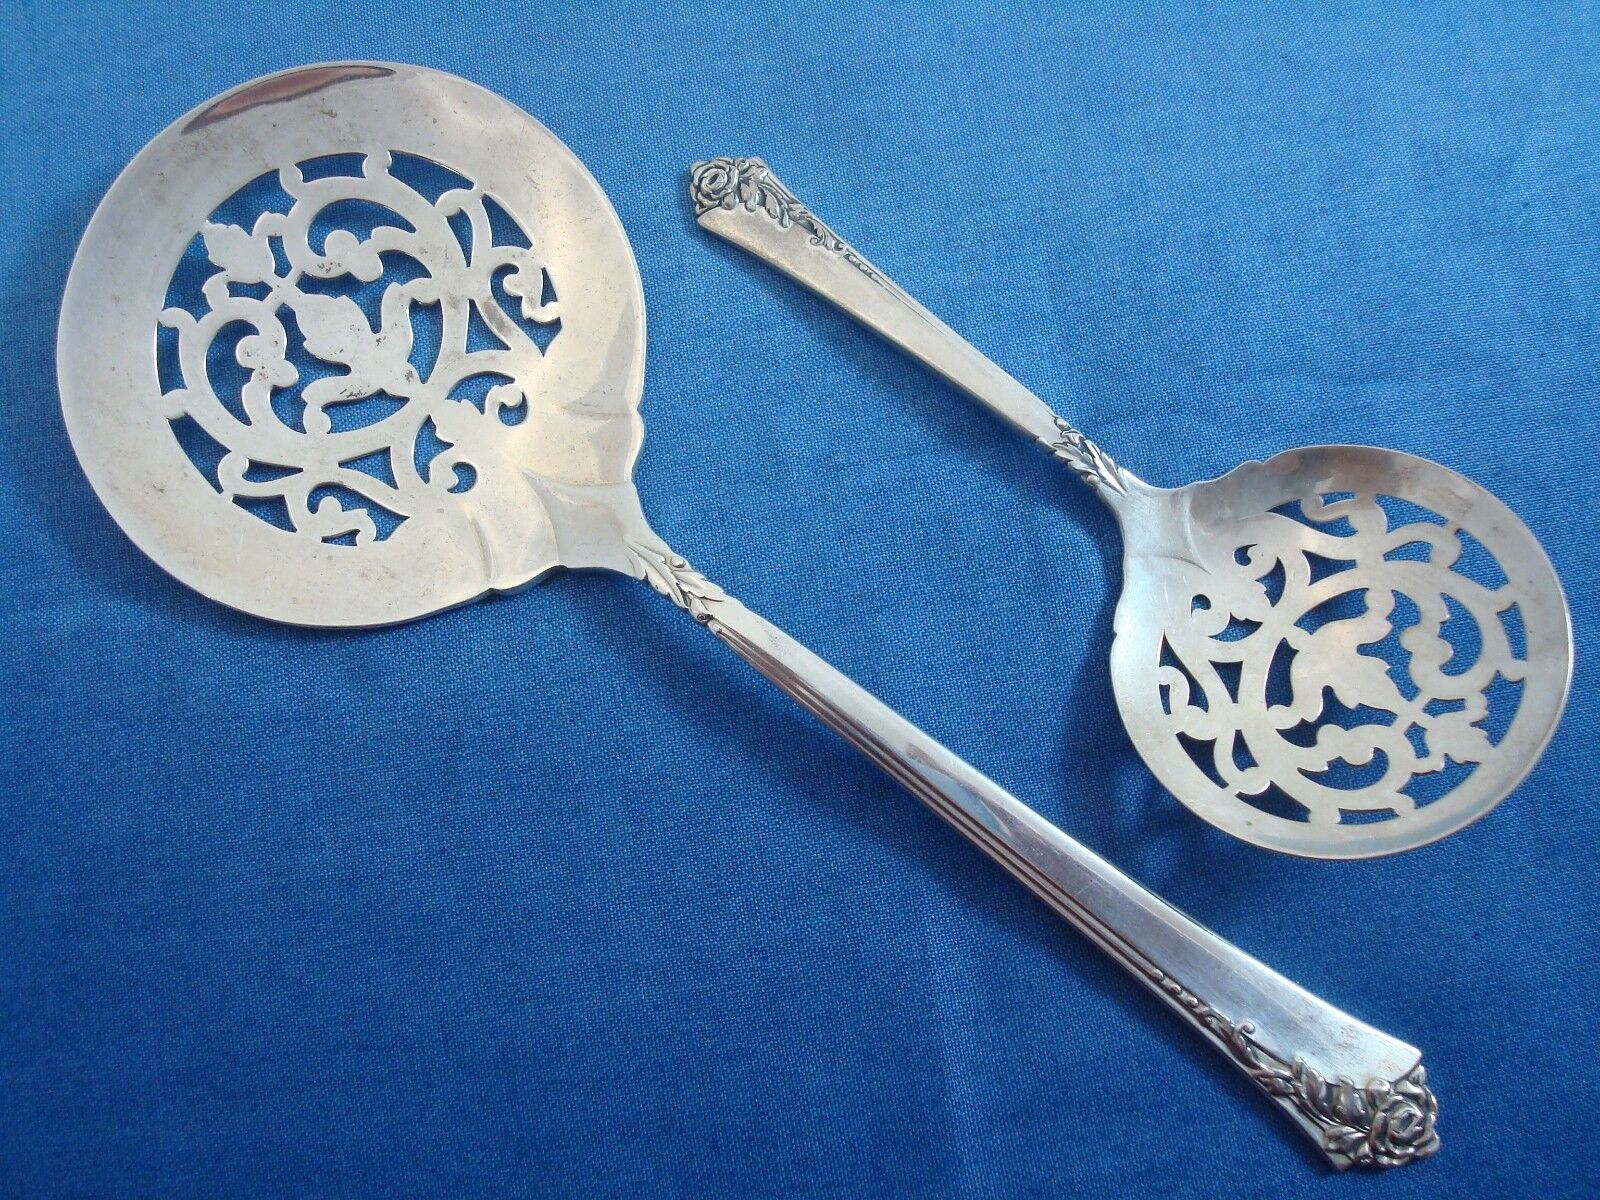 Damask Rose By Oneida Sterling Silver Flatware Set Service